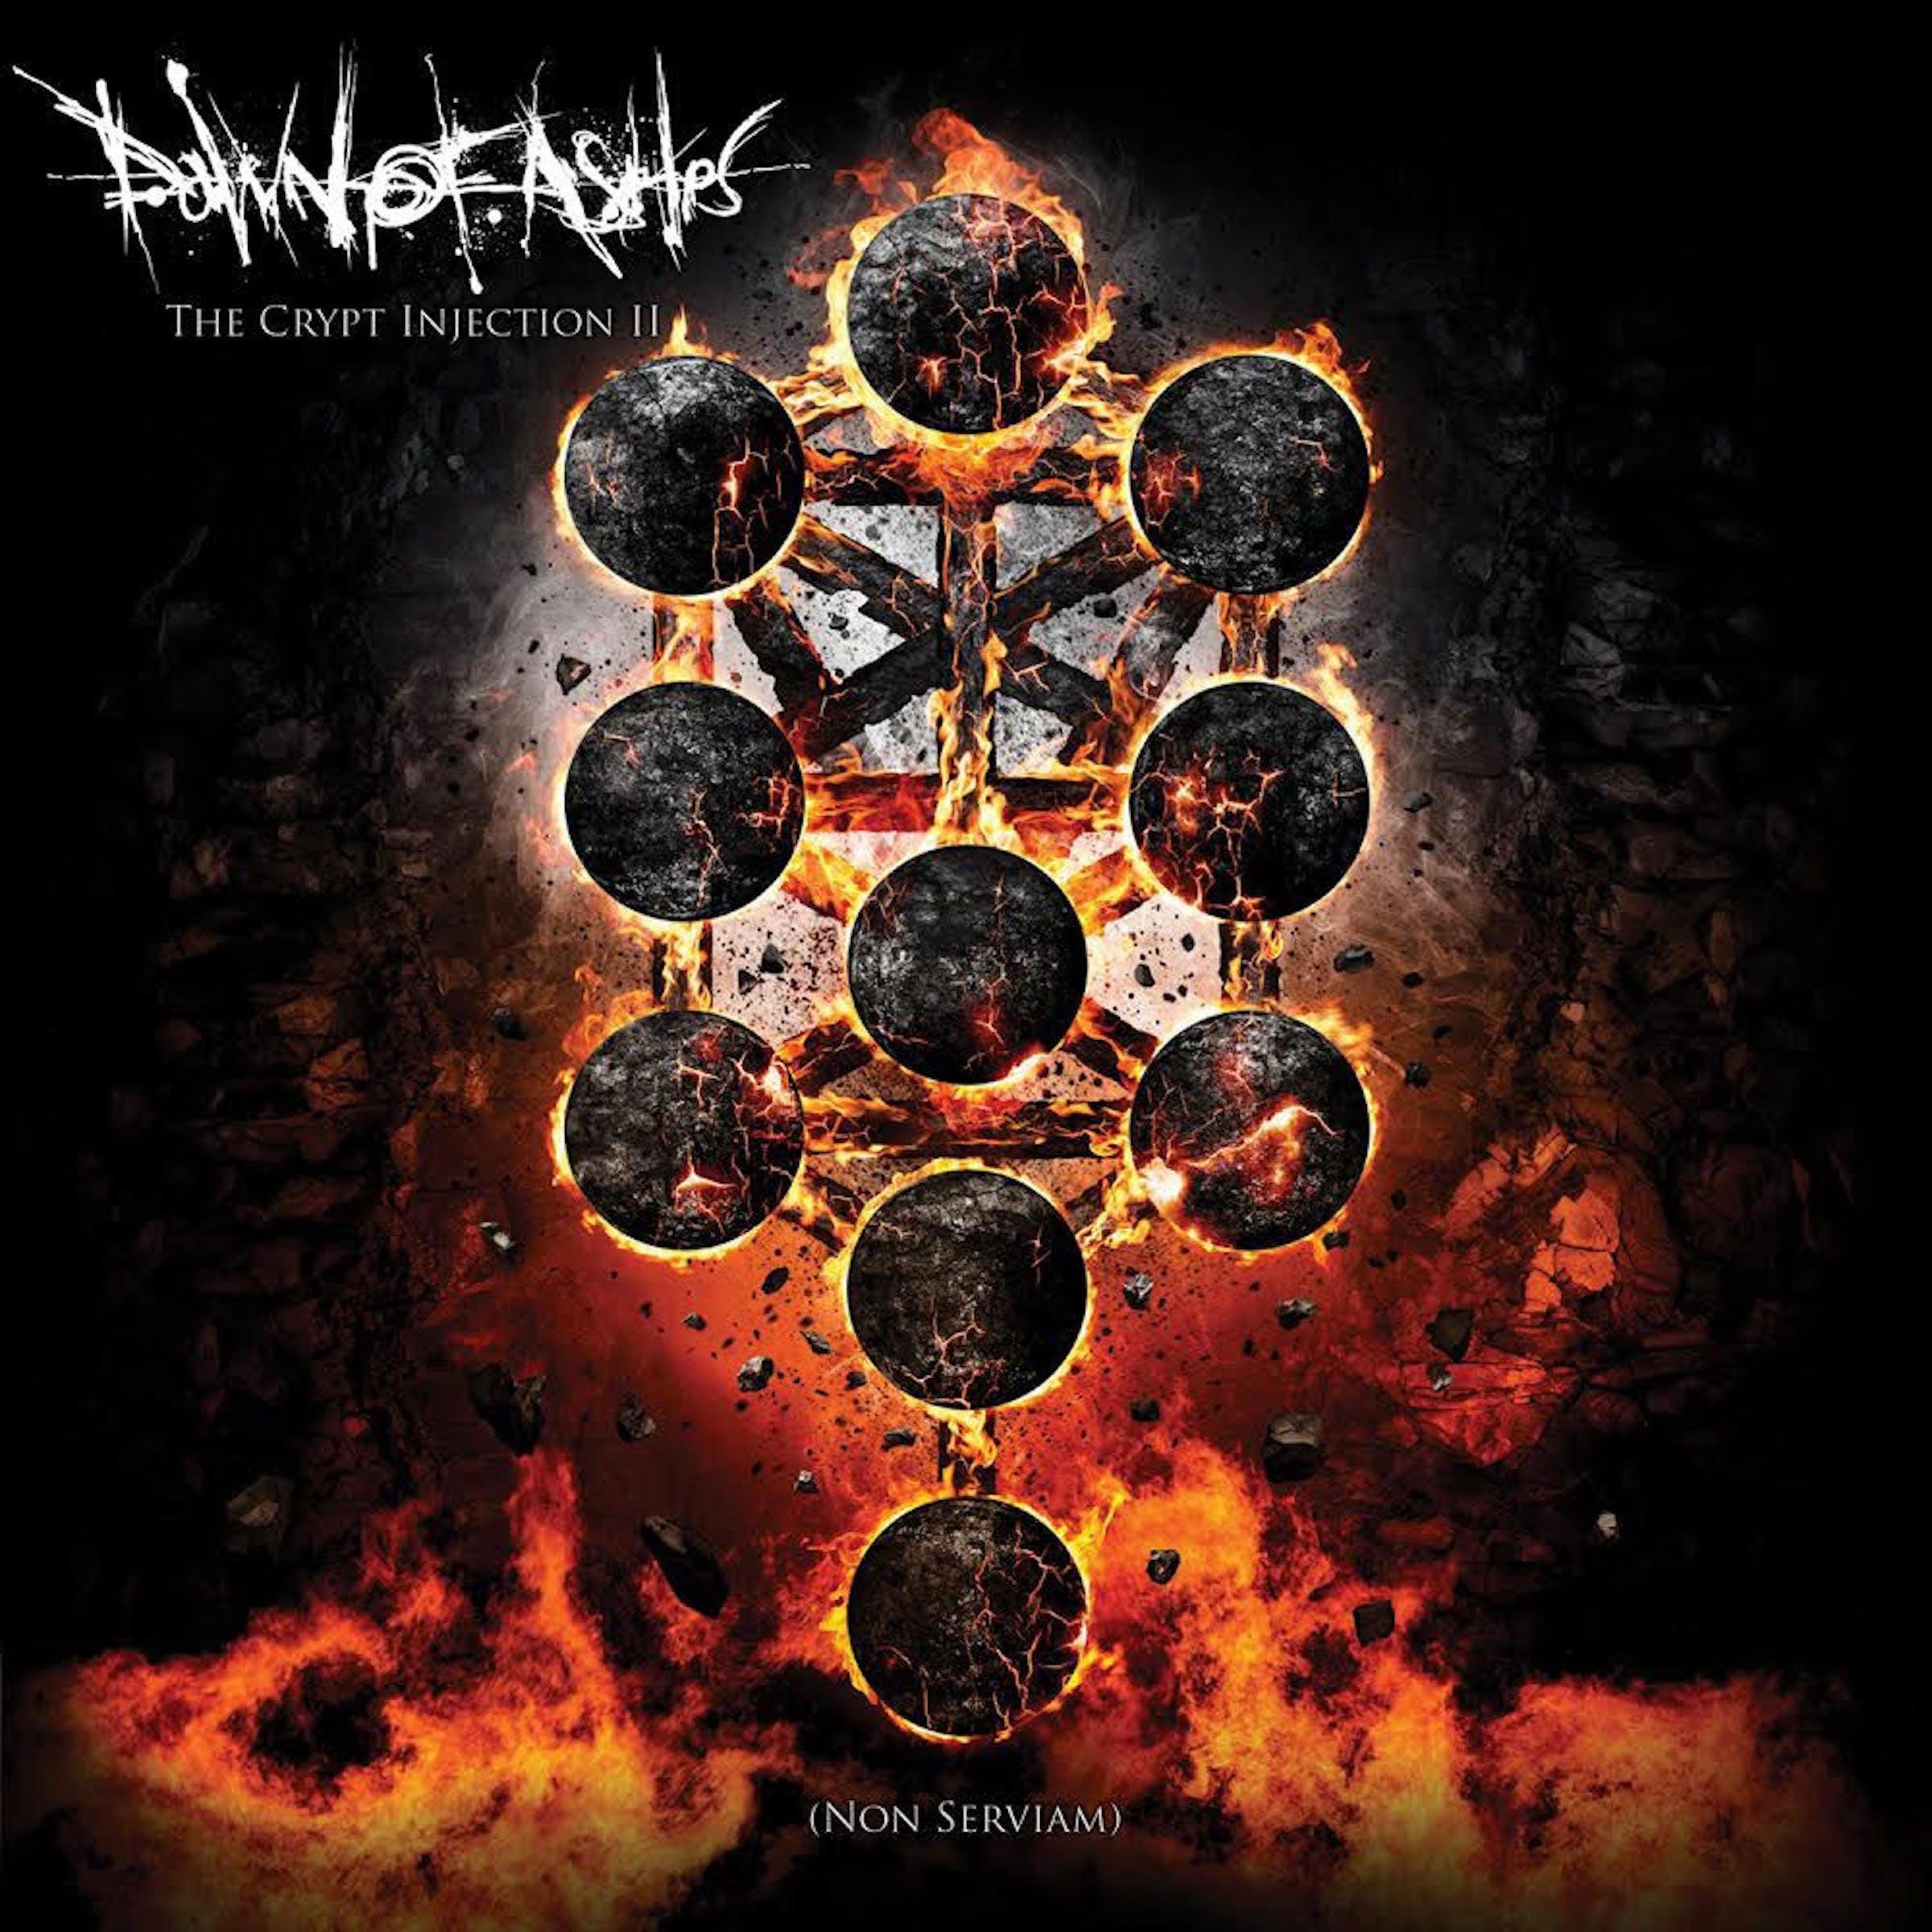 Dawn Of Ashes Tci2 Album Art